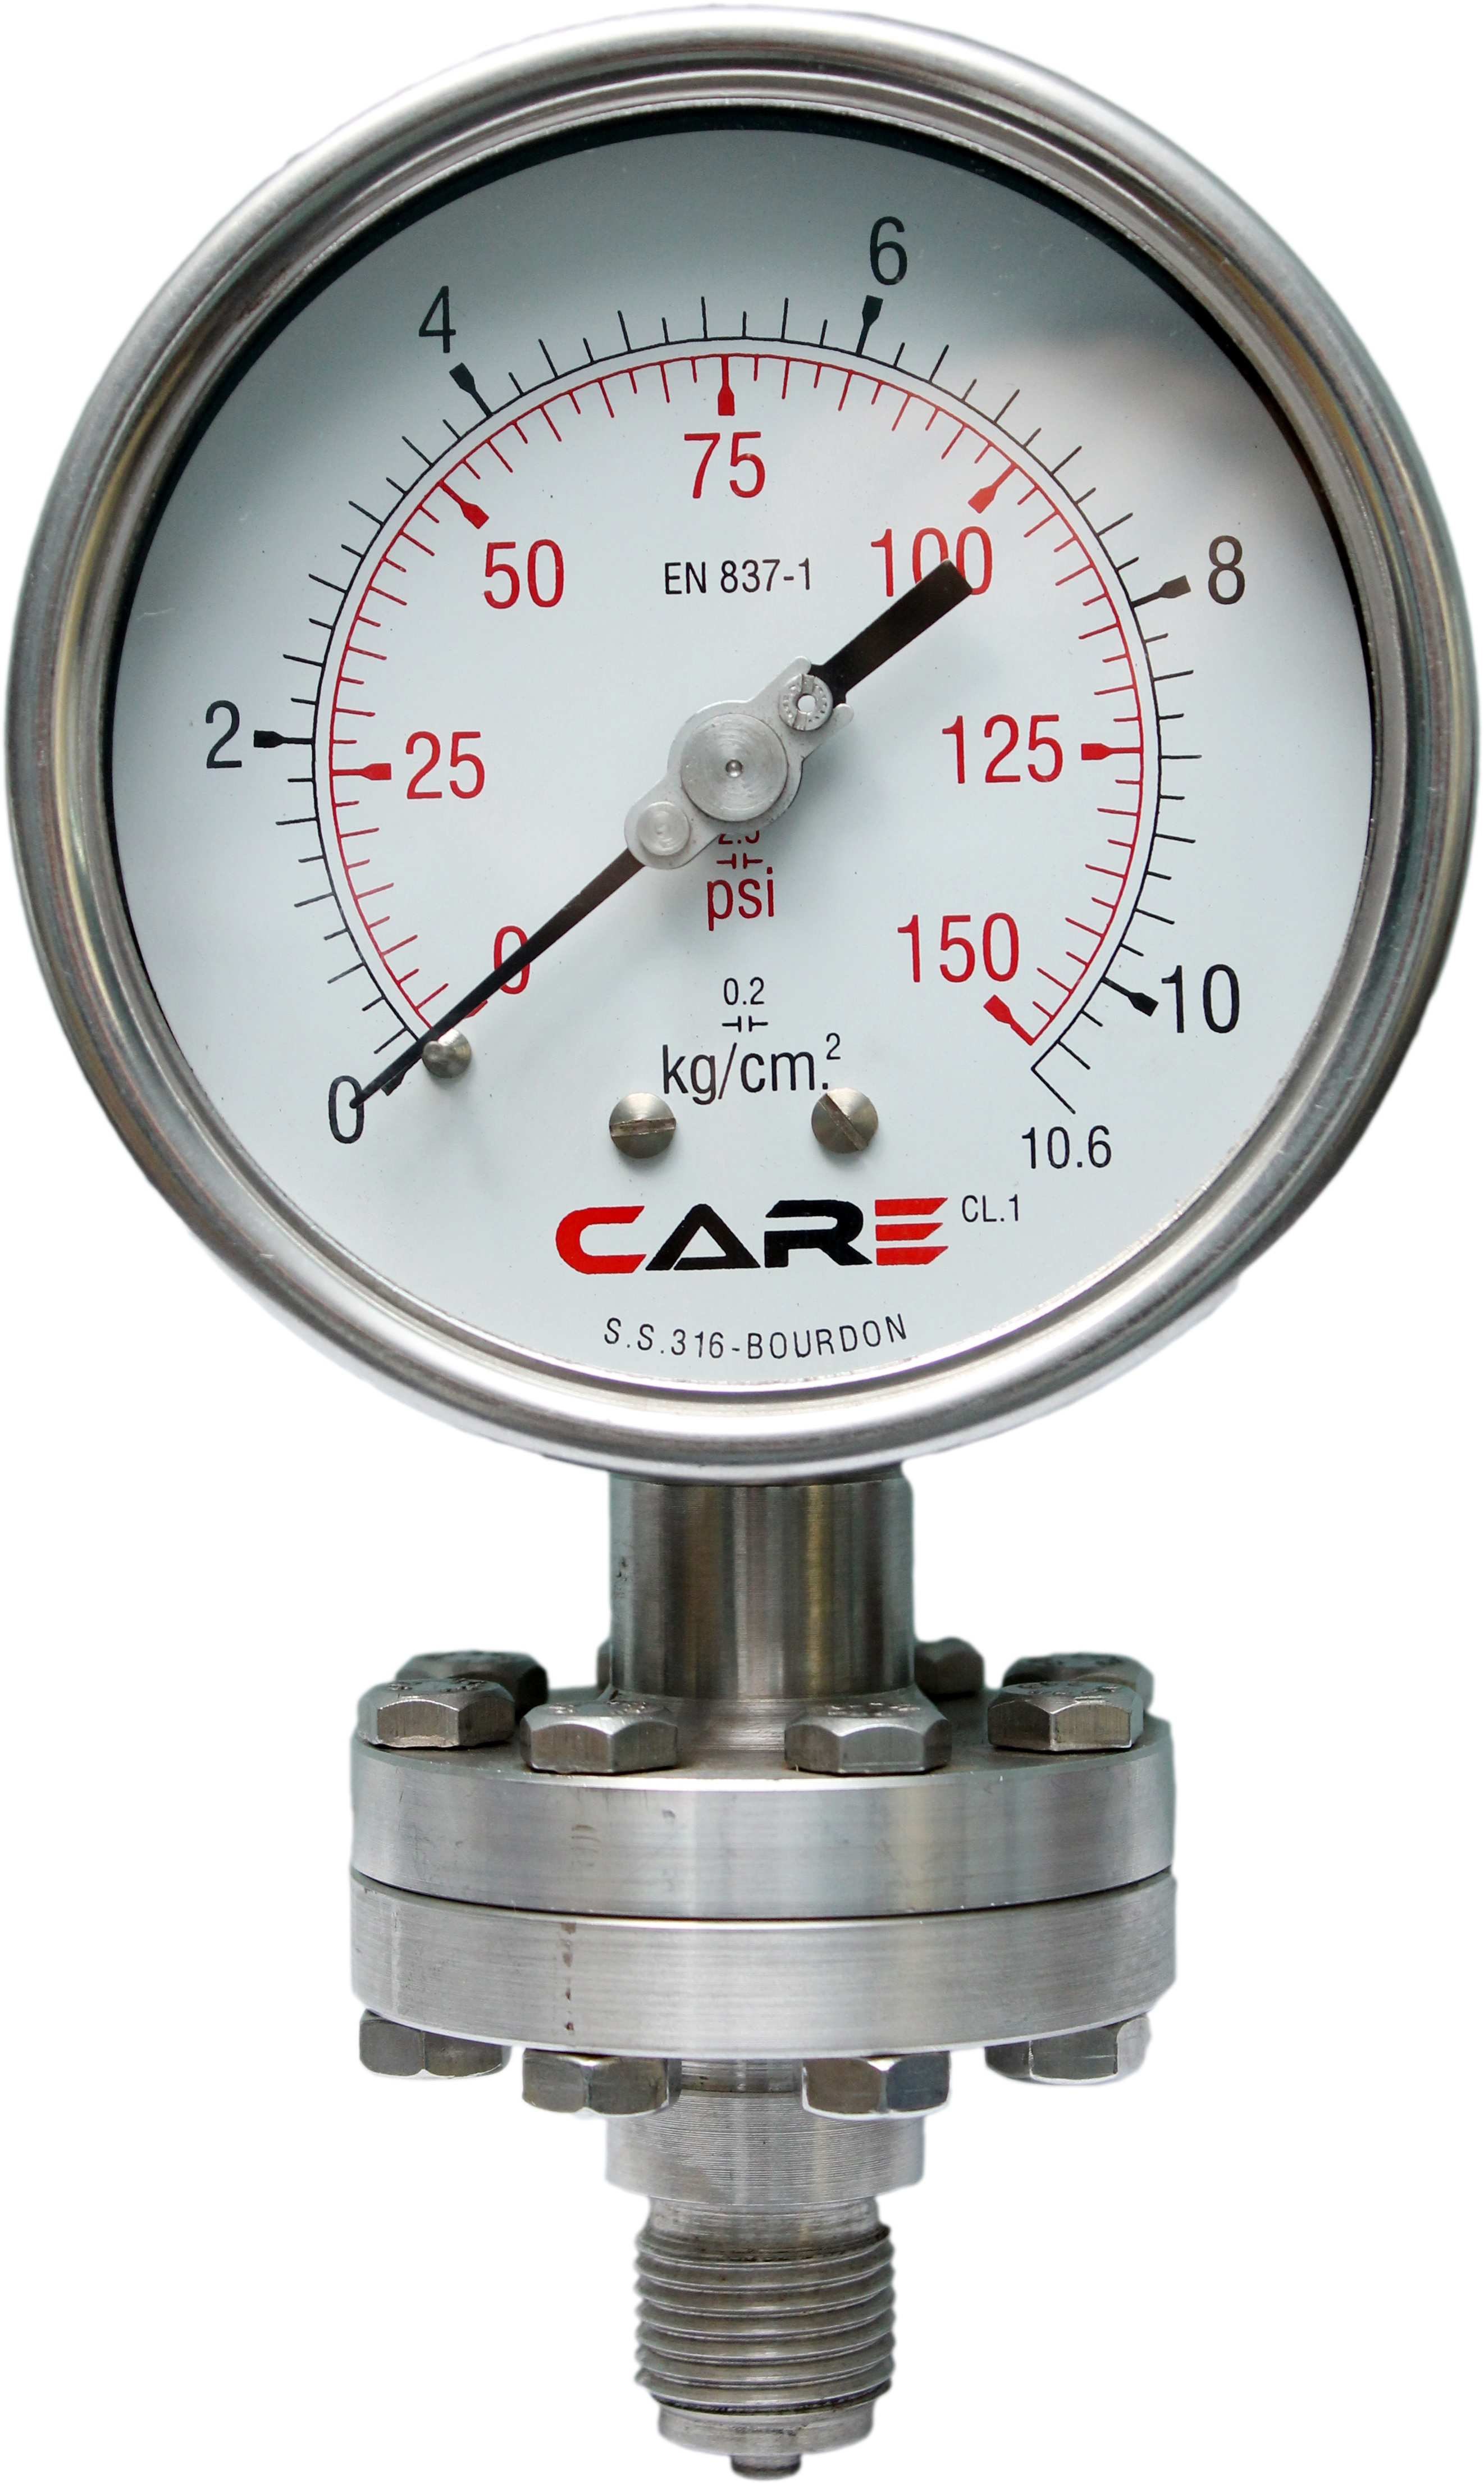 Care Process Instrument